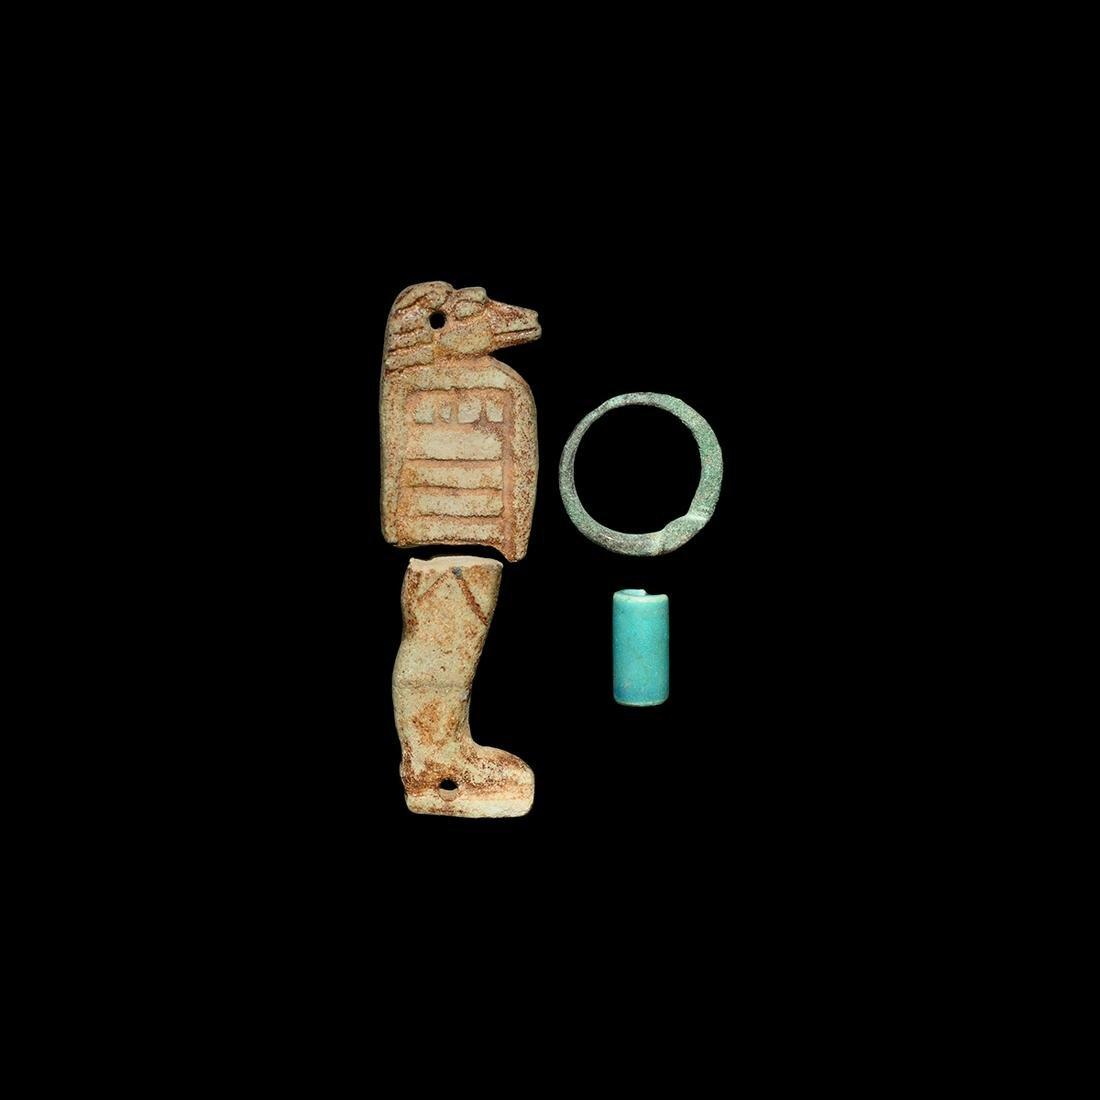 Egyptian Artefact Collection